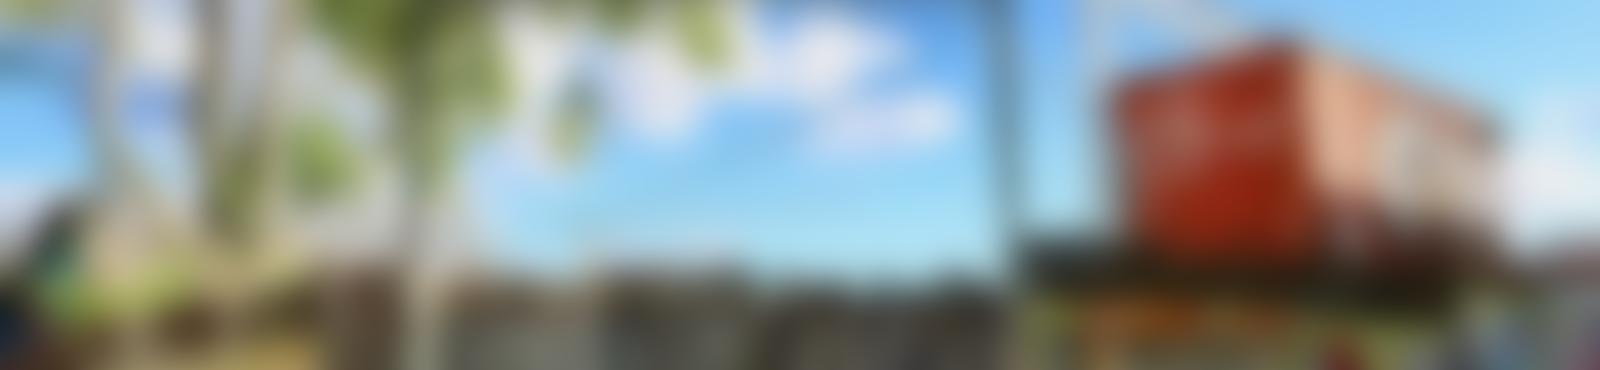 Blurred c70011d1 29fd 4d8e aeed 955e0d2319b5